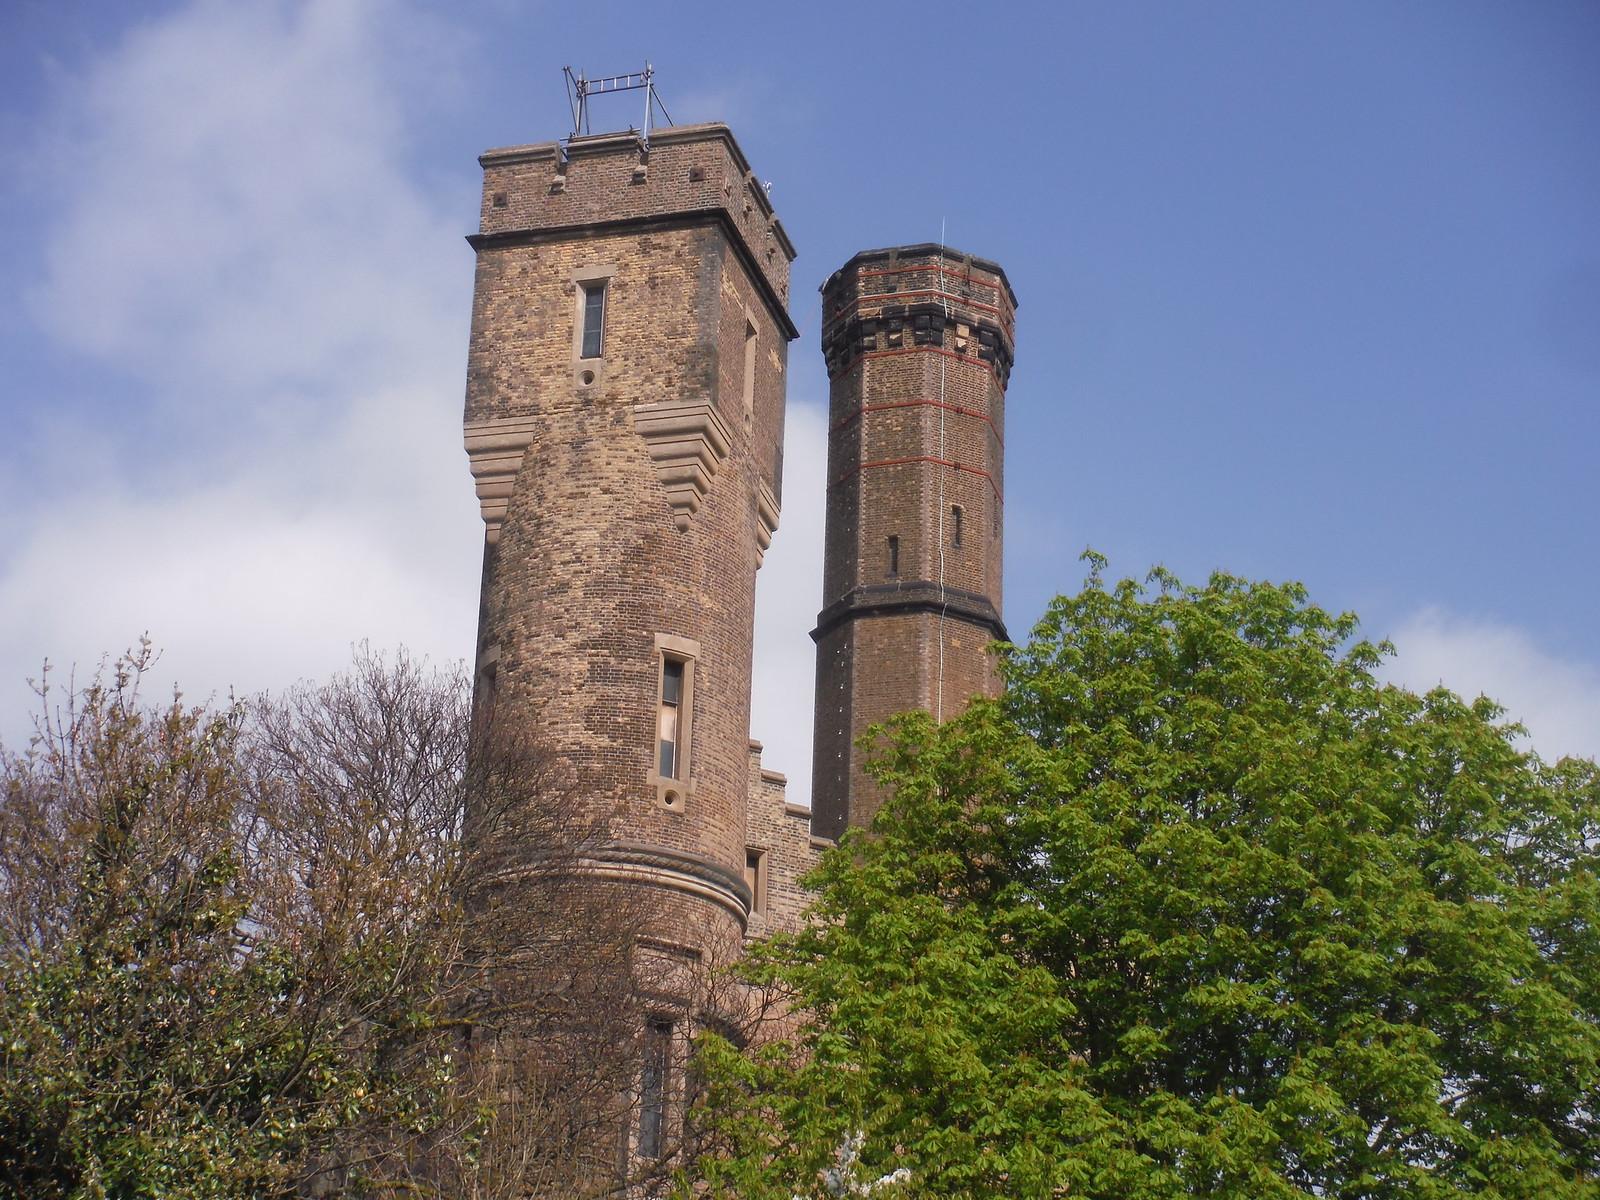 Turrets, The Castle Climbing Centre, Green Lanes SWC Short Walk 26 - Woodberry Wetlands (Stoke Newington Reservoirs)